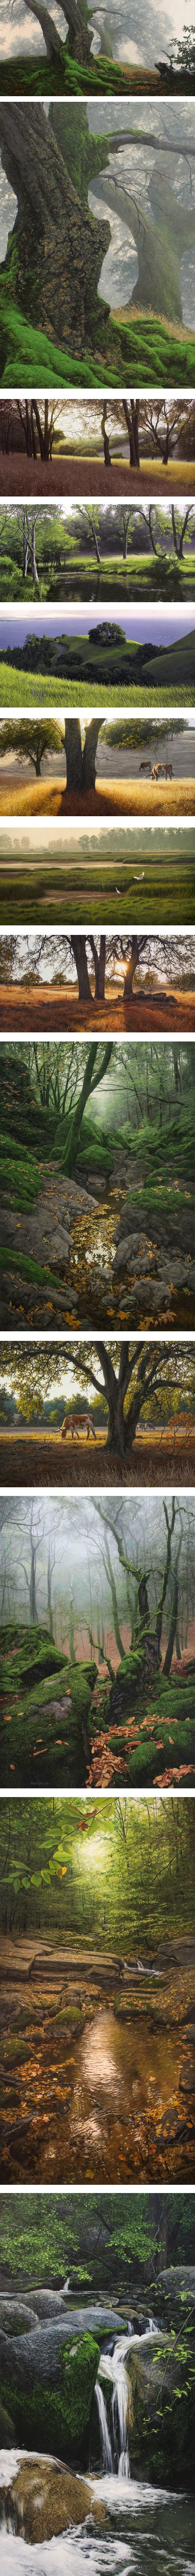 Adair Payne, landscape painting